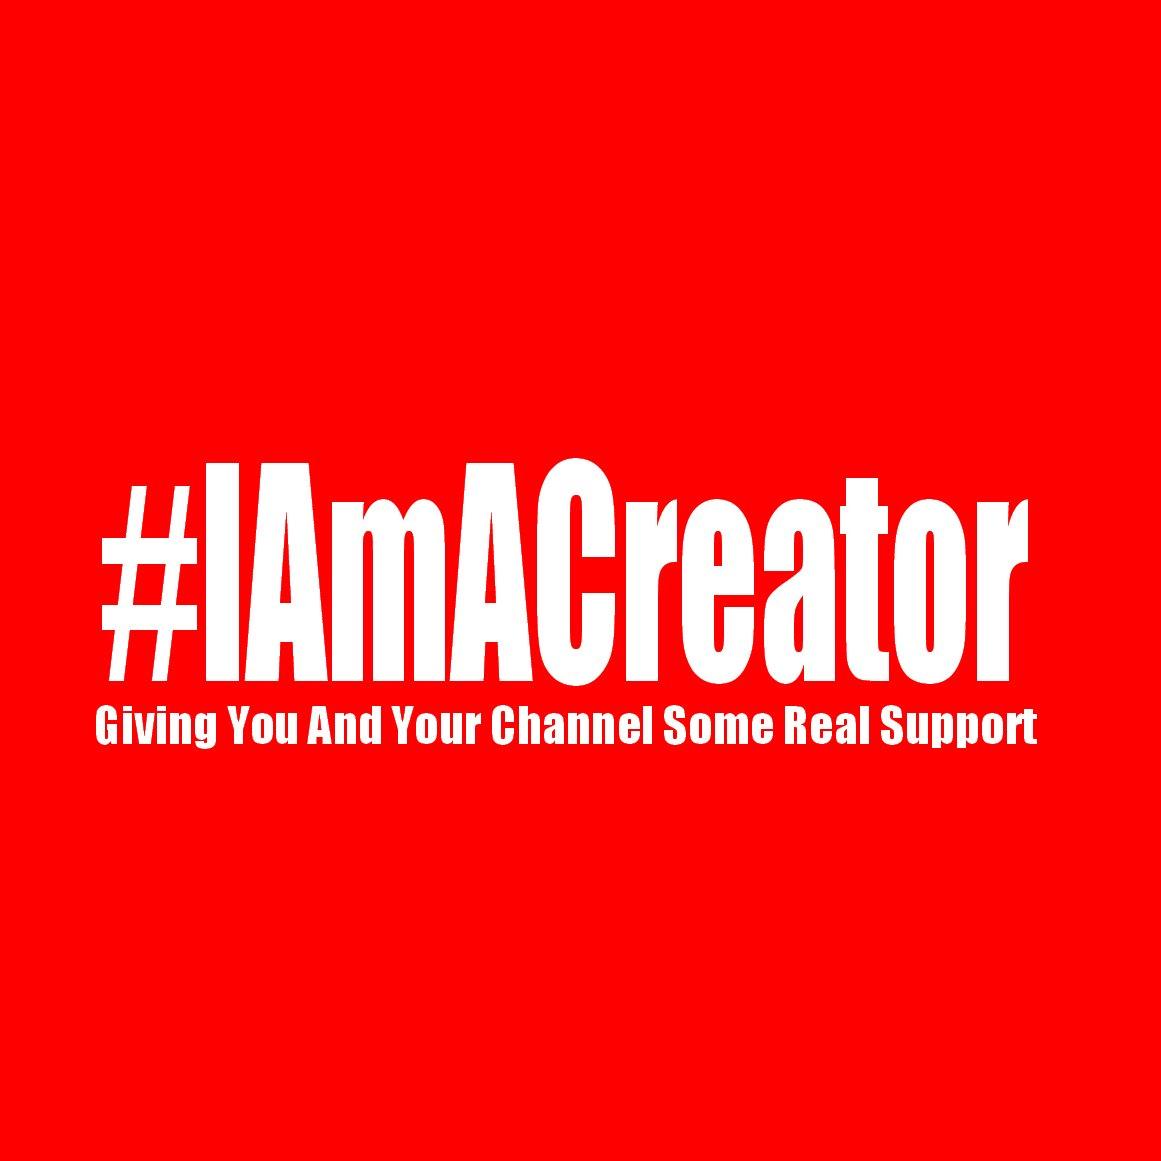 #IAmACreator #AwesomeSauce